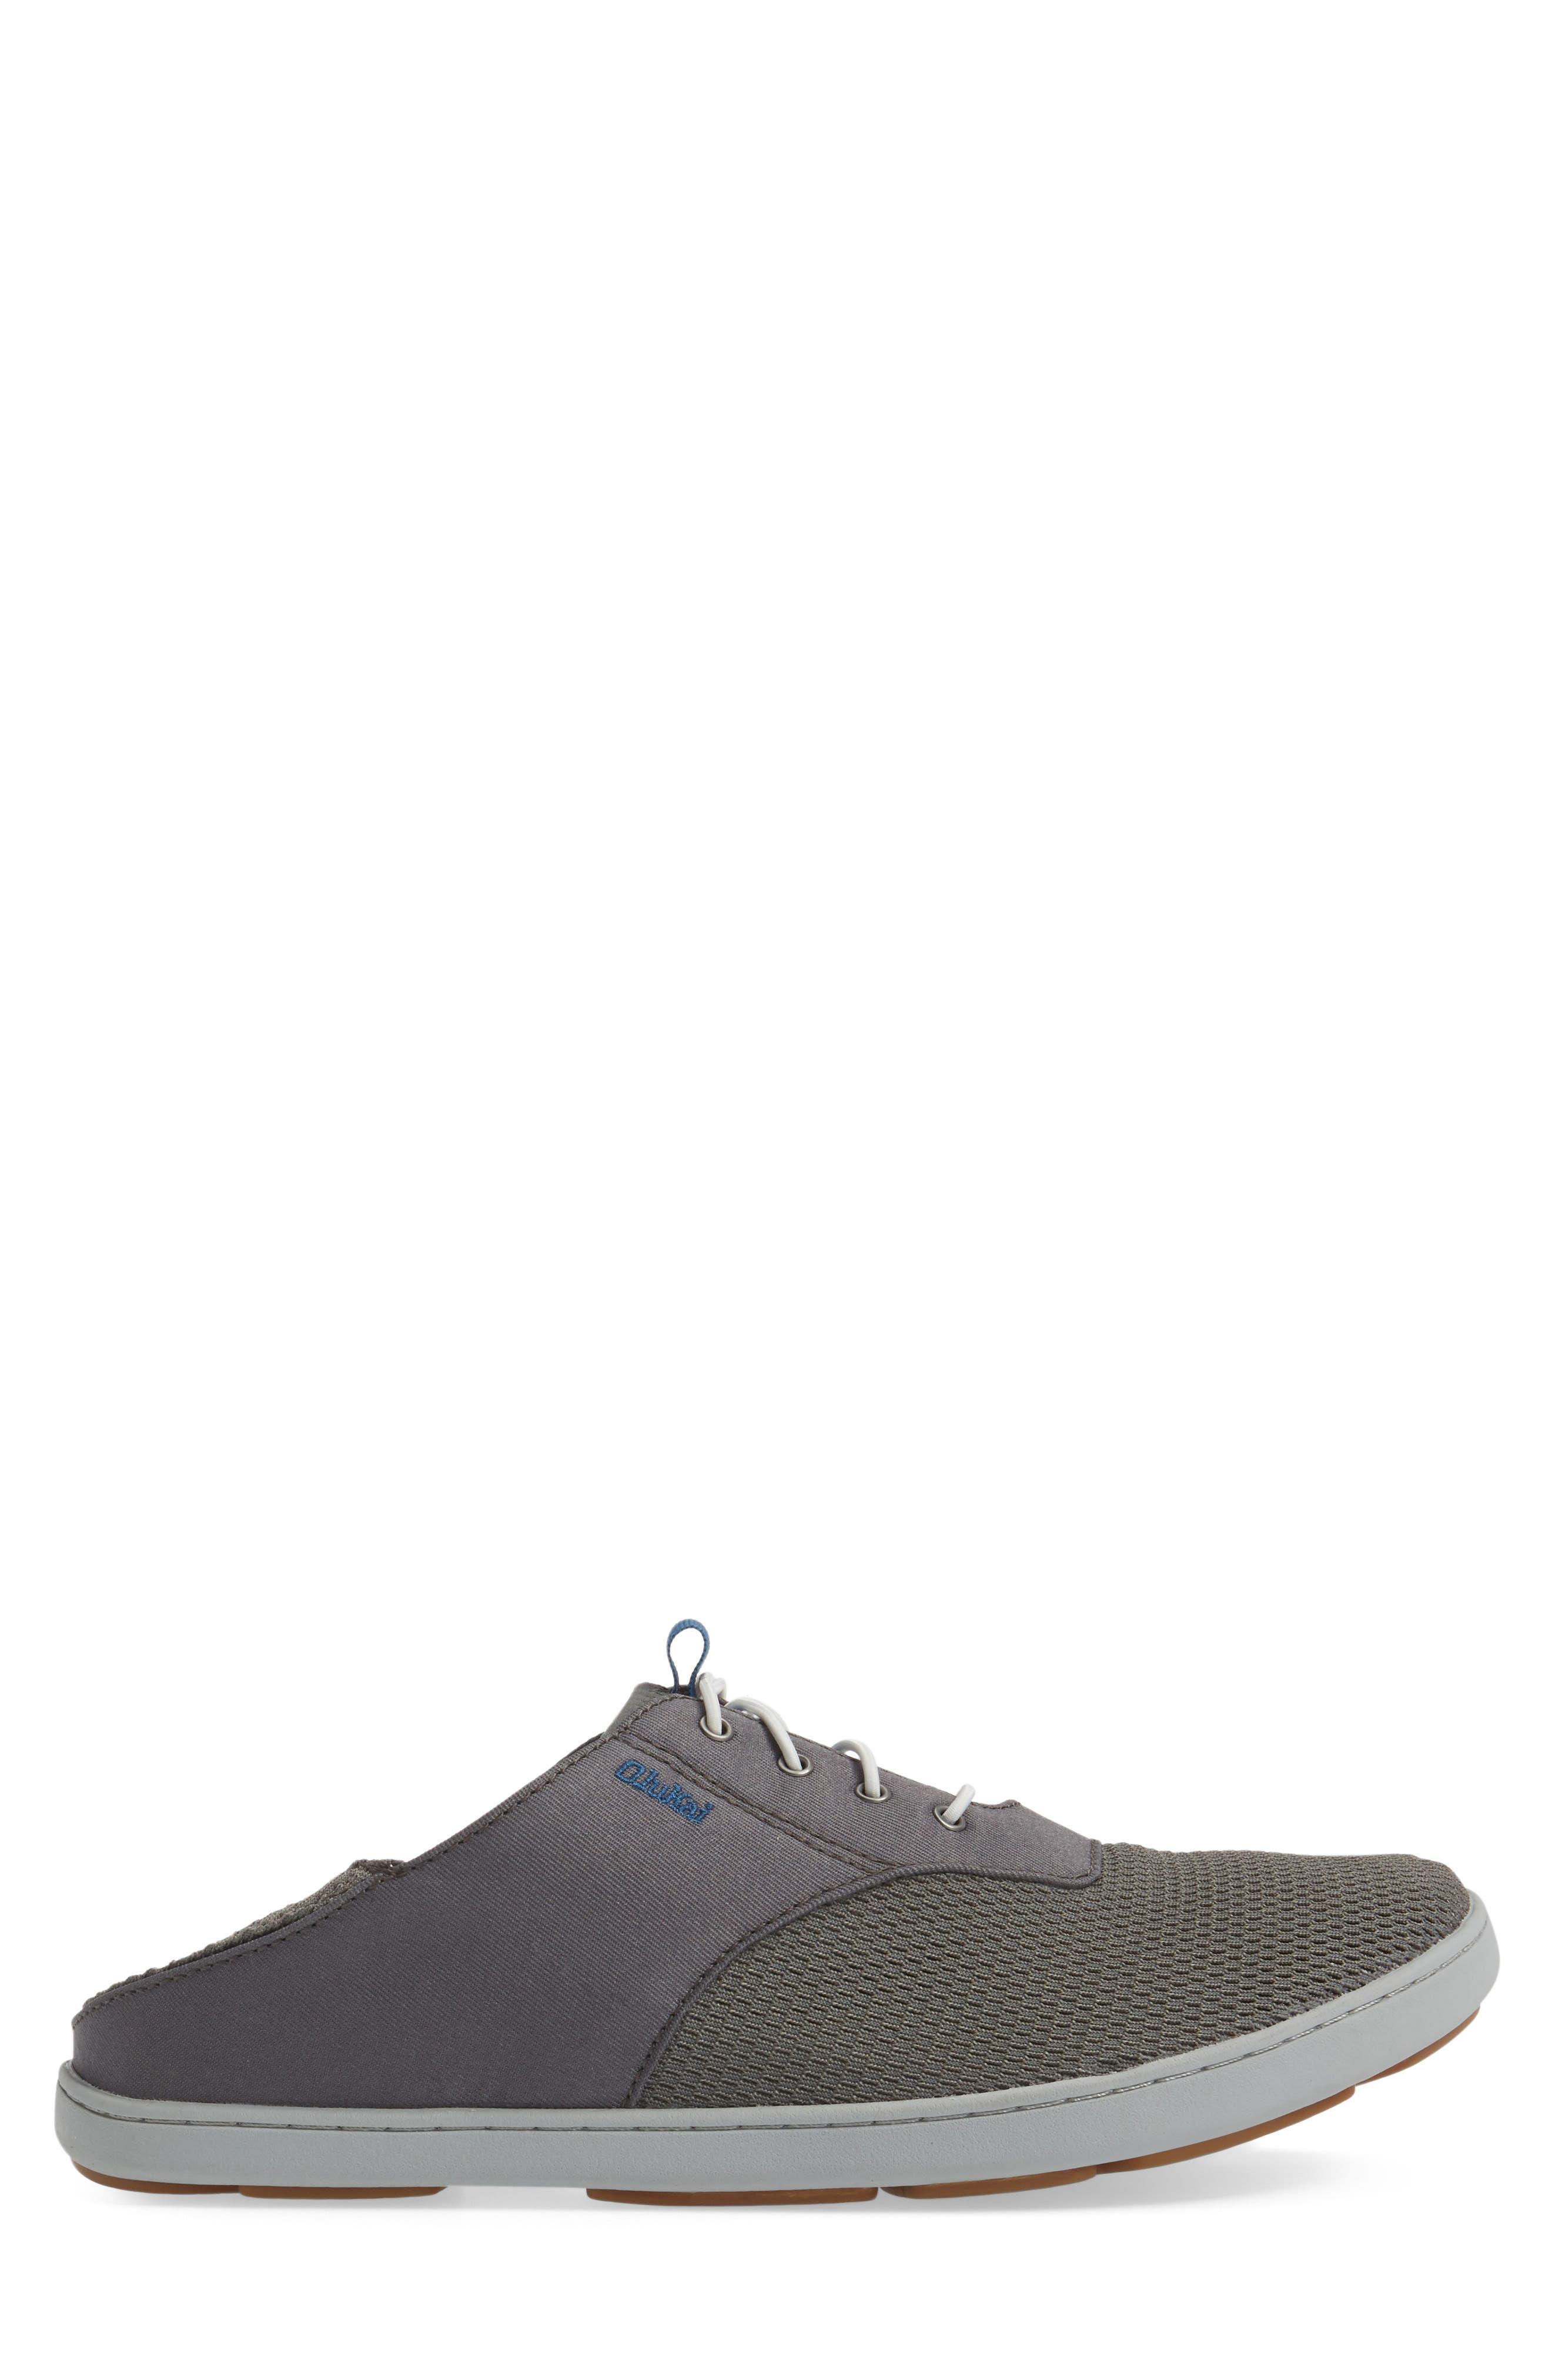 Alternate Image 3  - OluKai 'Nohea Moku' Sneaker (Men)